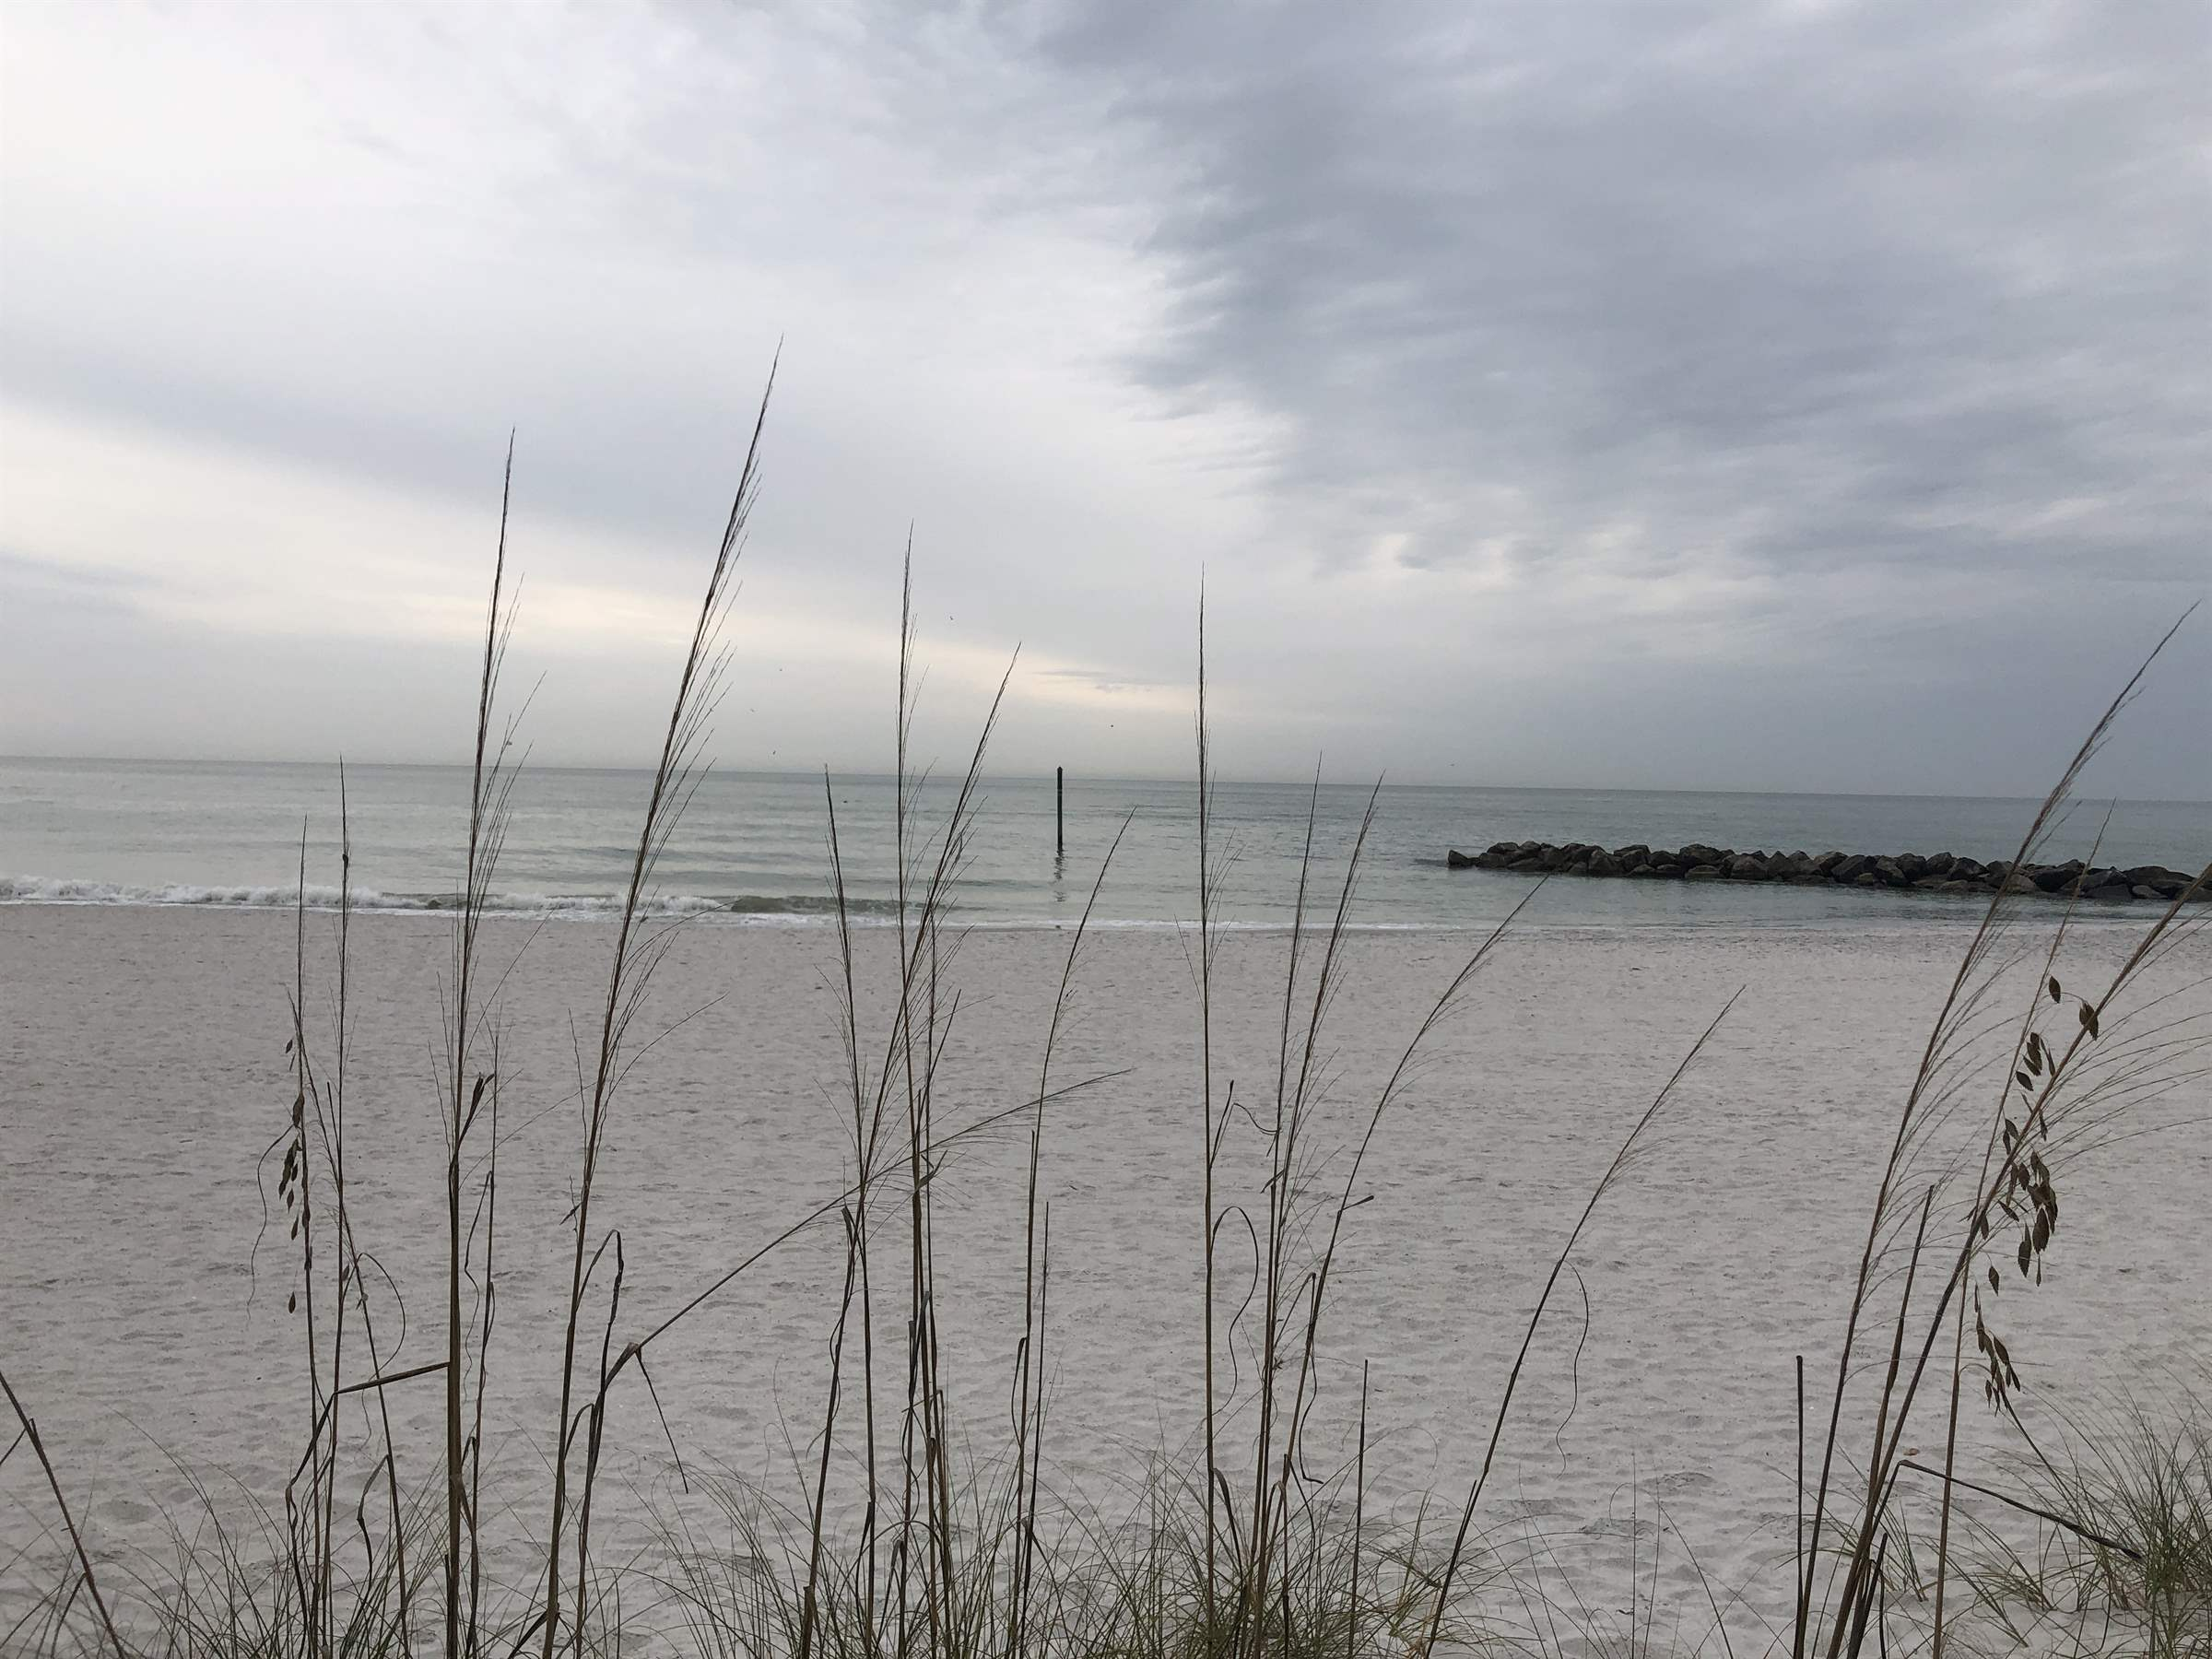 7100 Sunset Way, #712, Saint Pete Beach, FL 33706